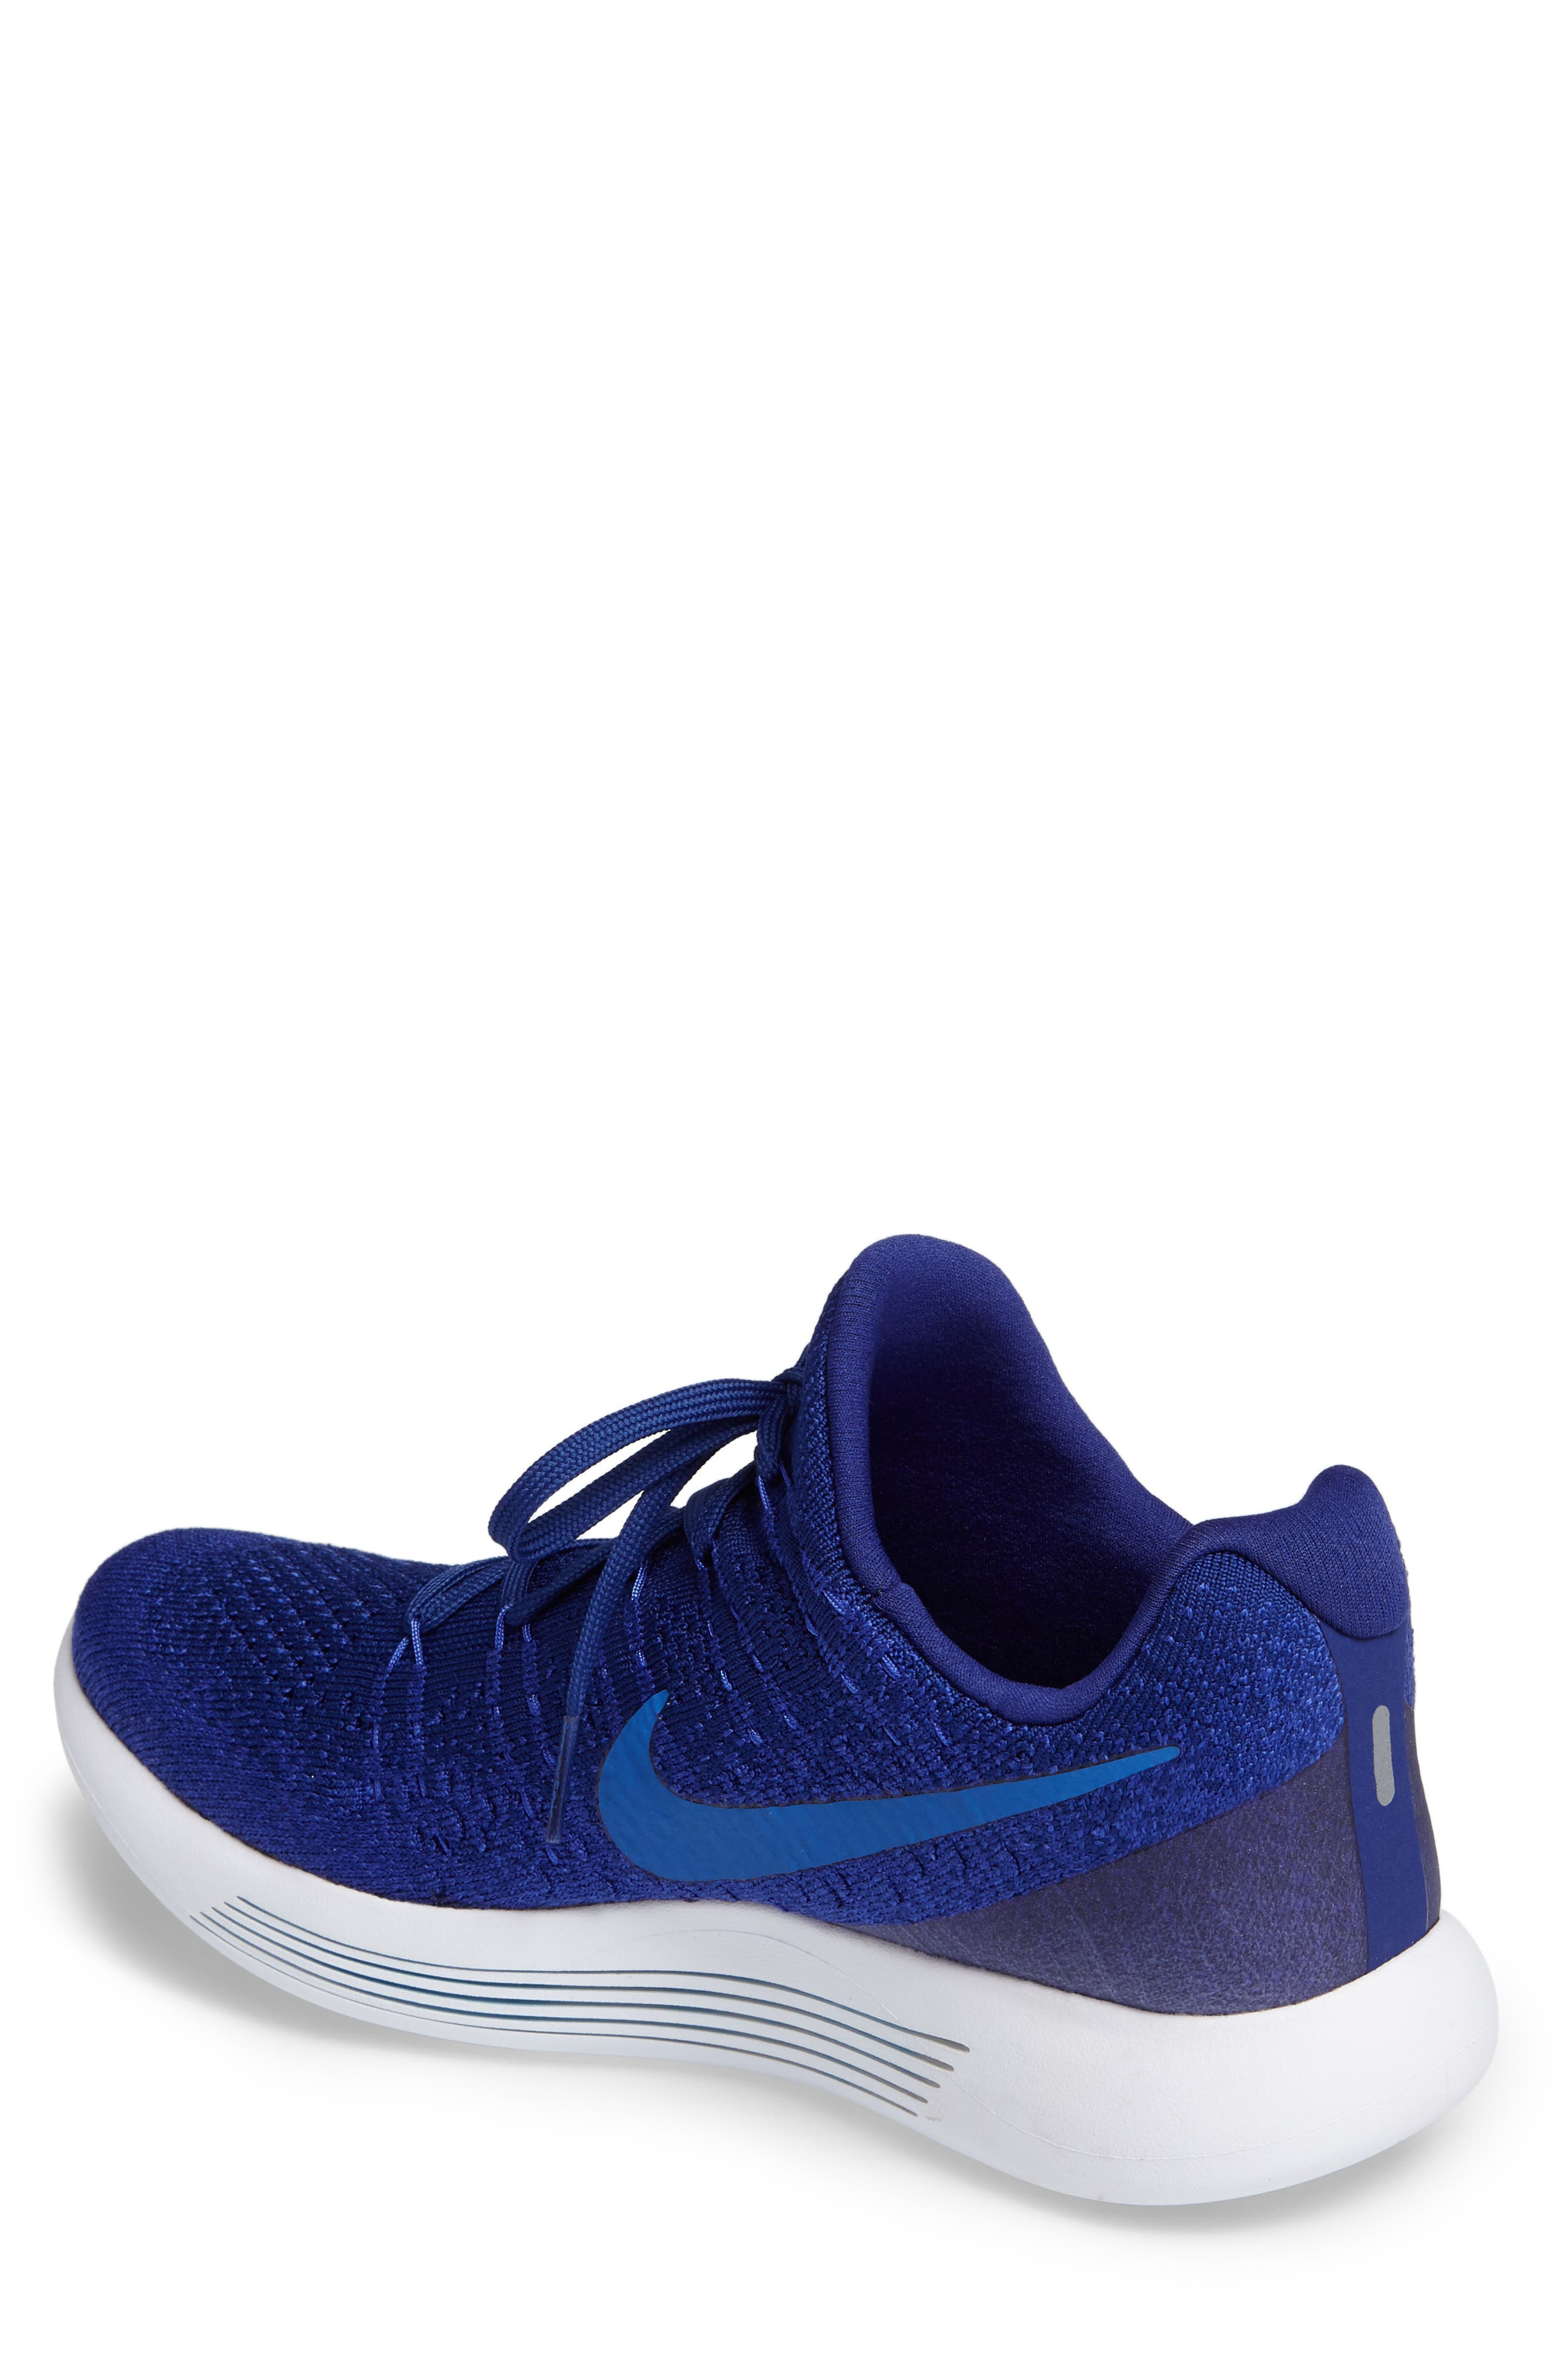 Flyknit 2 LunarEpic Running Shoe,                             Alternate thumbnail 2, color,                             Royal Blue/ Blue